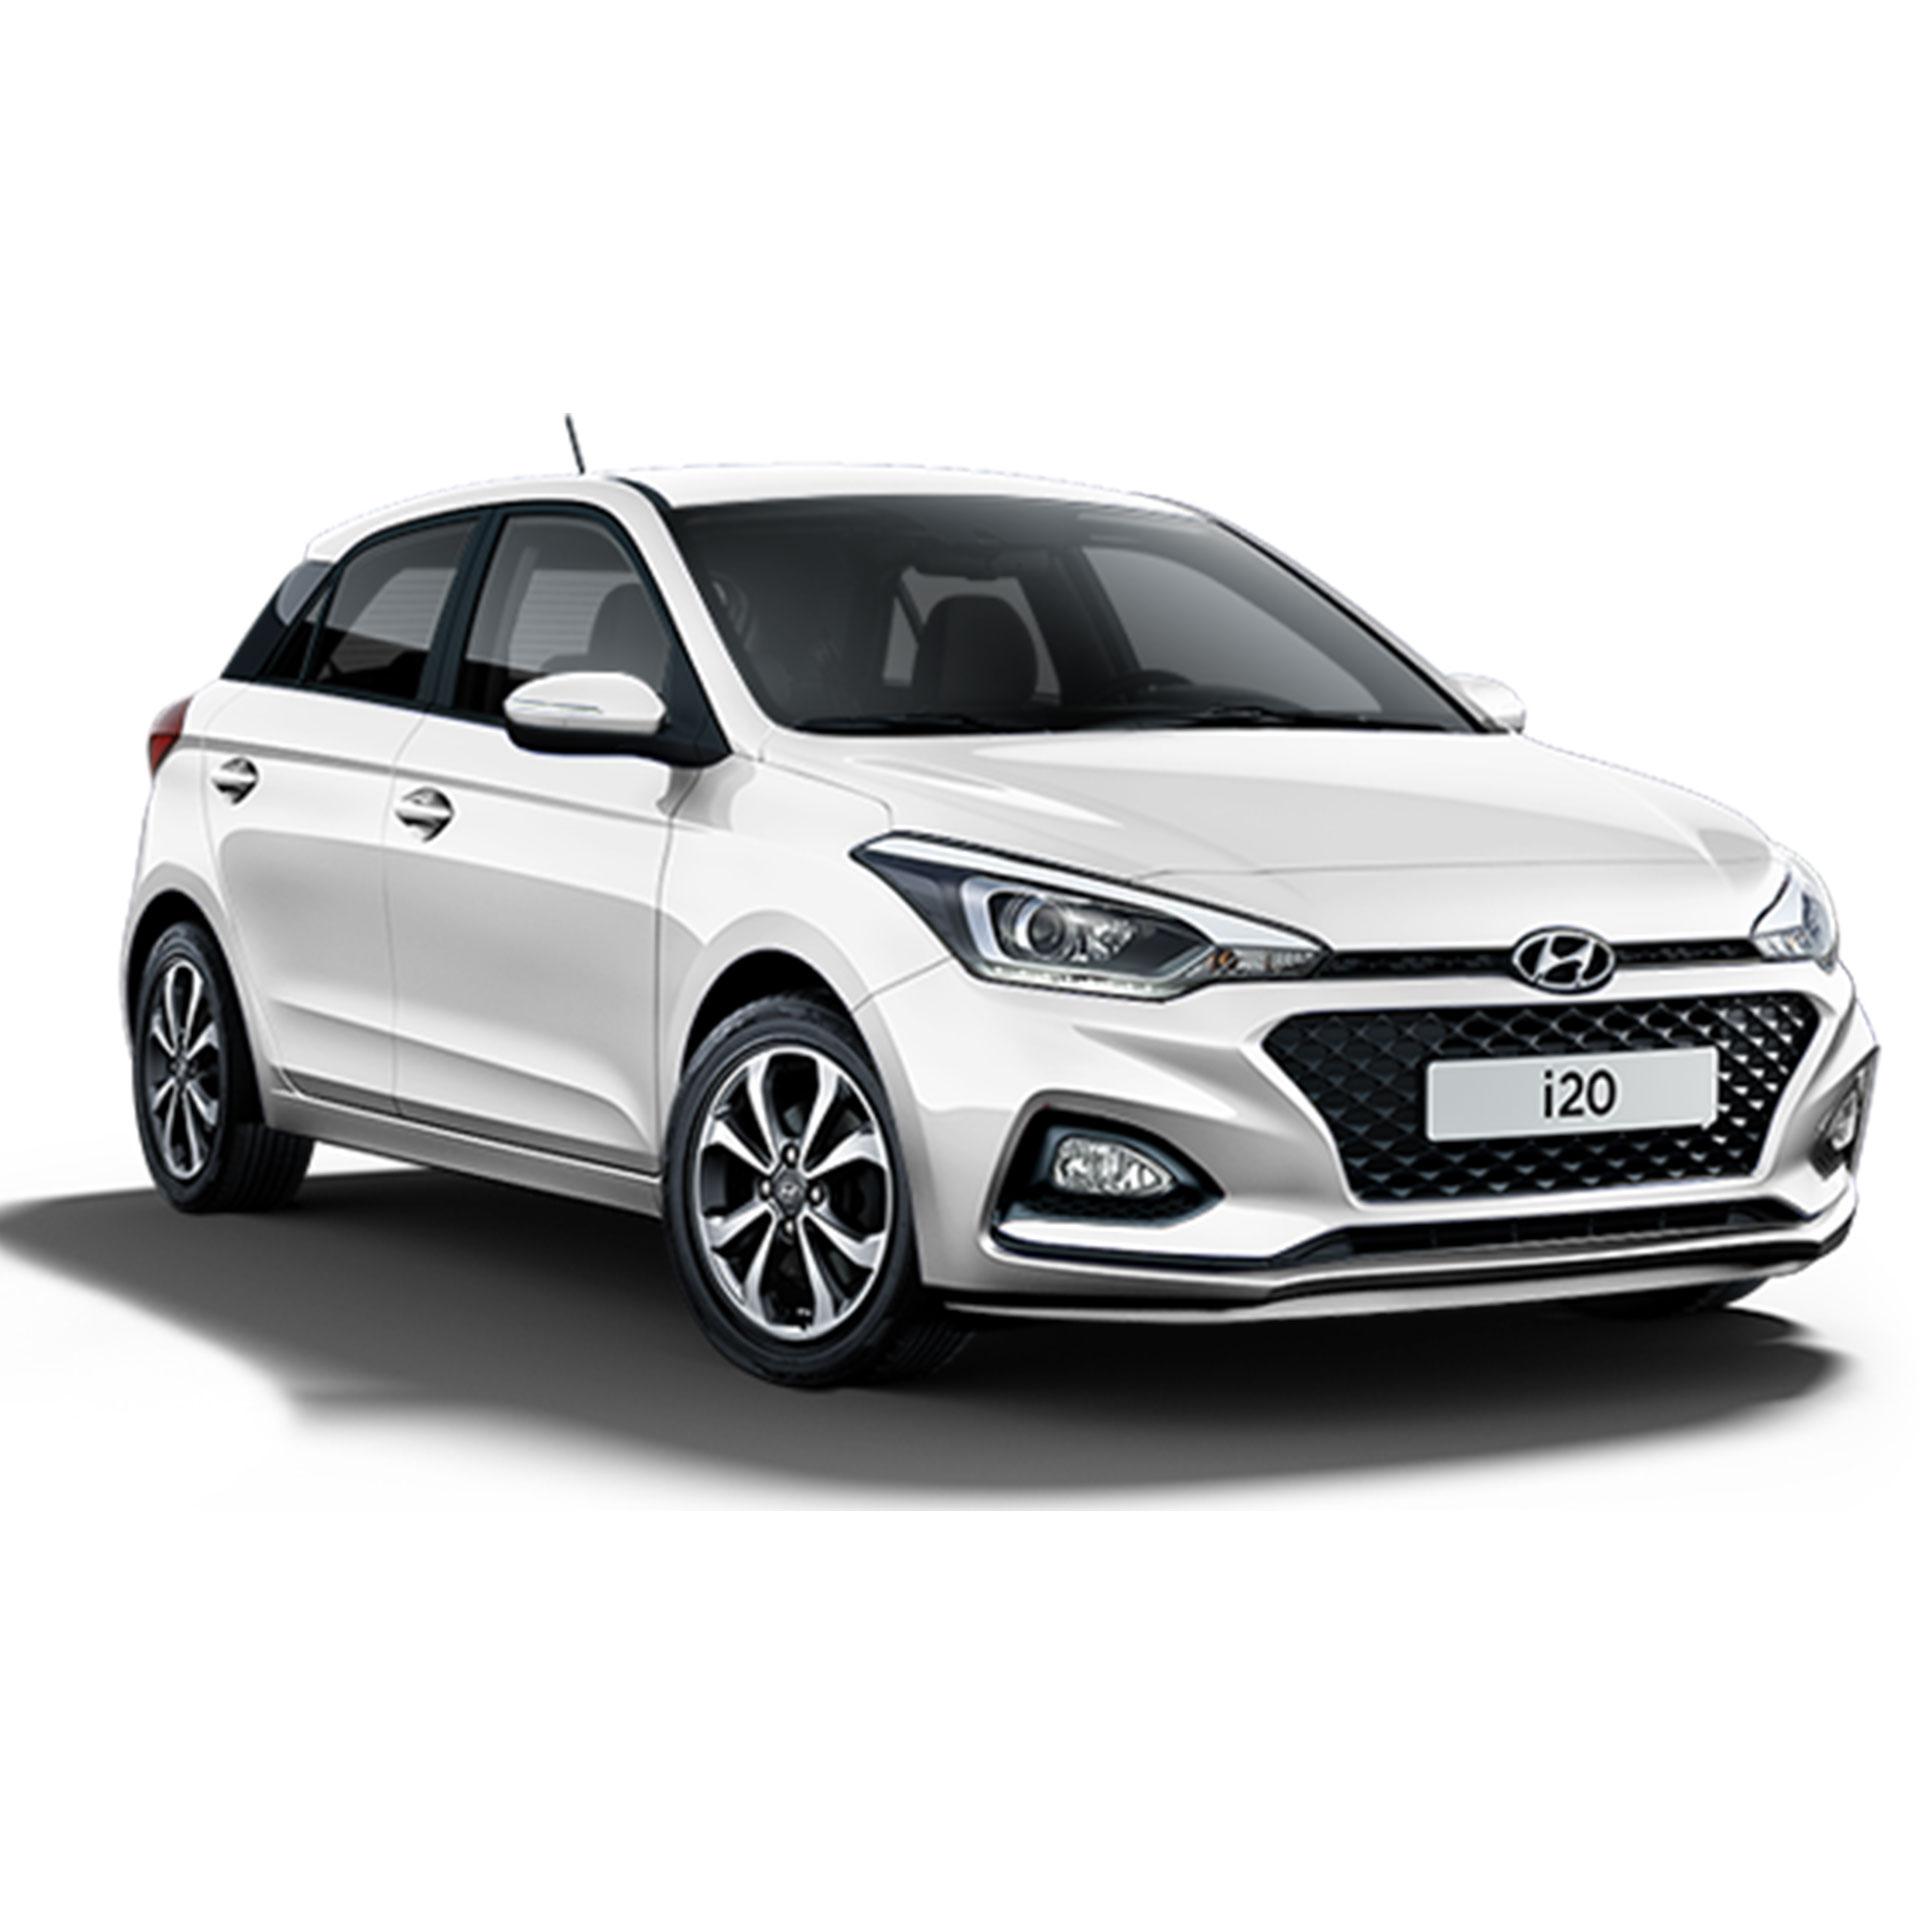 Hyundai i20 Boot Liners 2014 - 2020